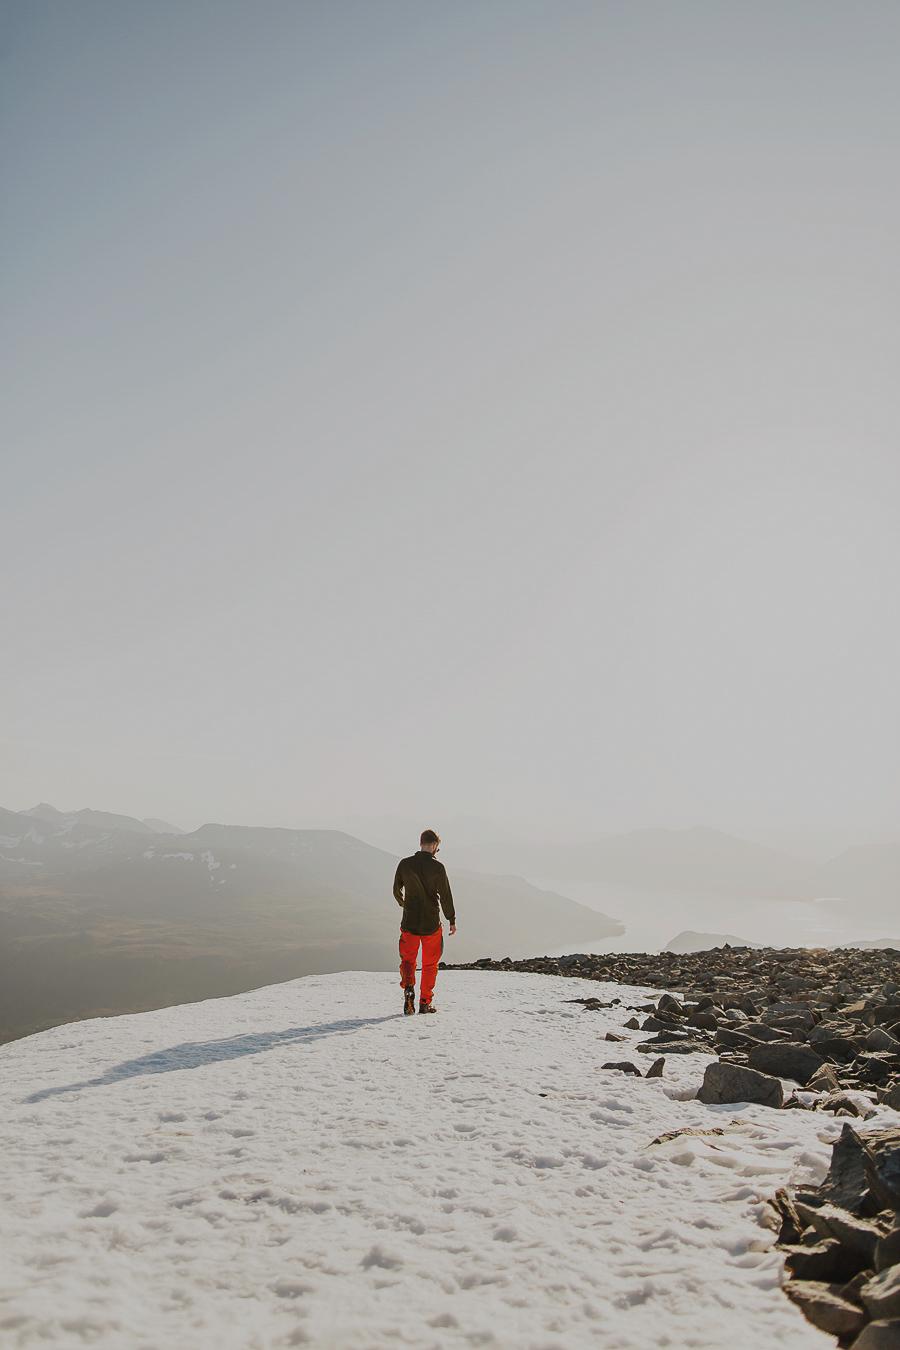 Boy walking on snow